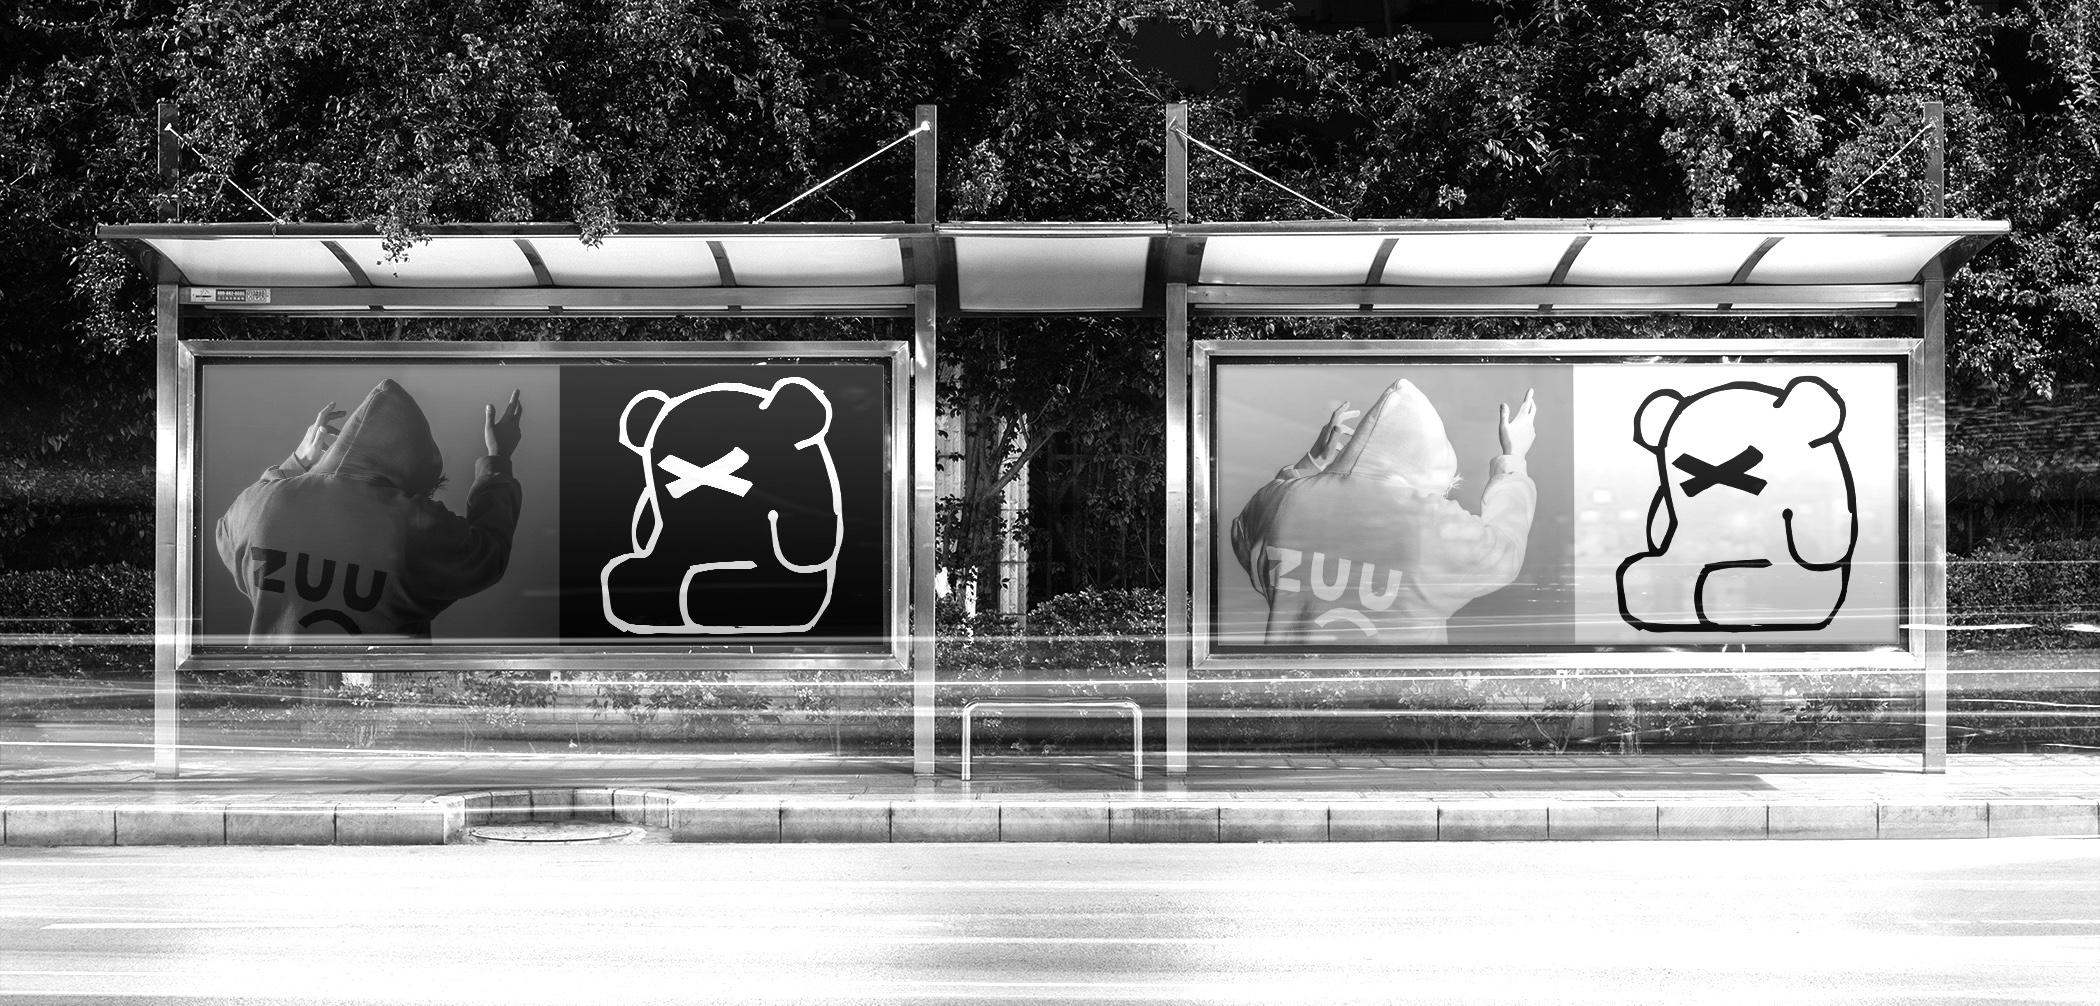 ZUU_street_advertising.jpg